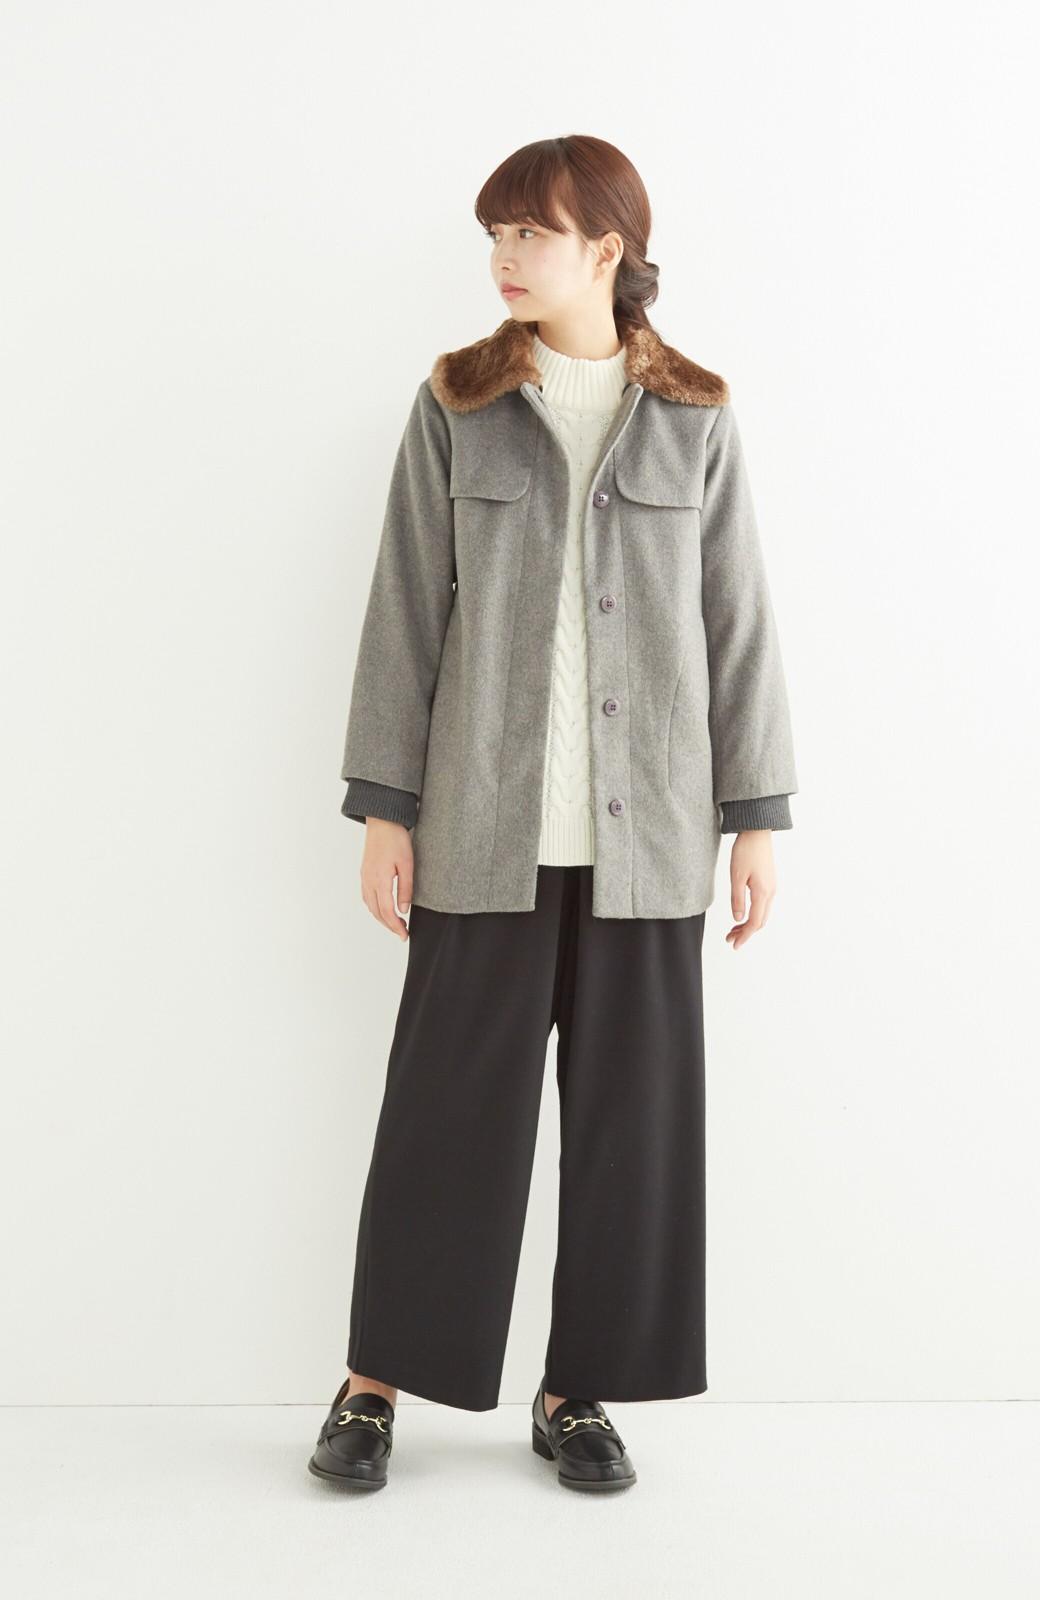 pilvee 取り外しフェイクファー衿付き ウール混のノーカラーコート <グレー>の商品写真8